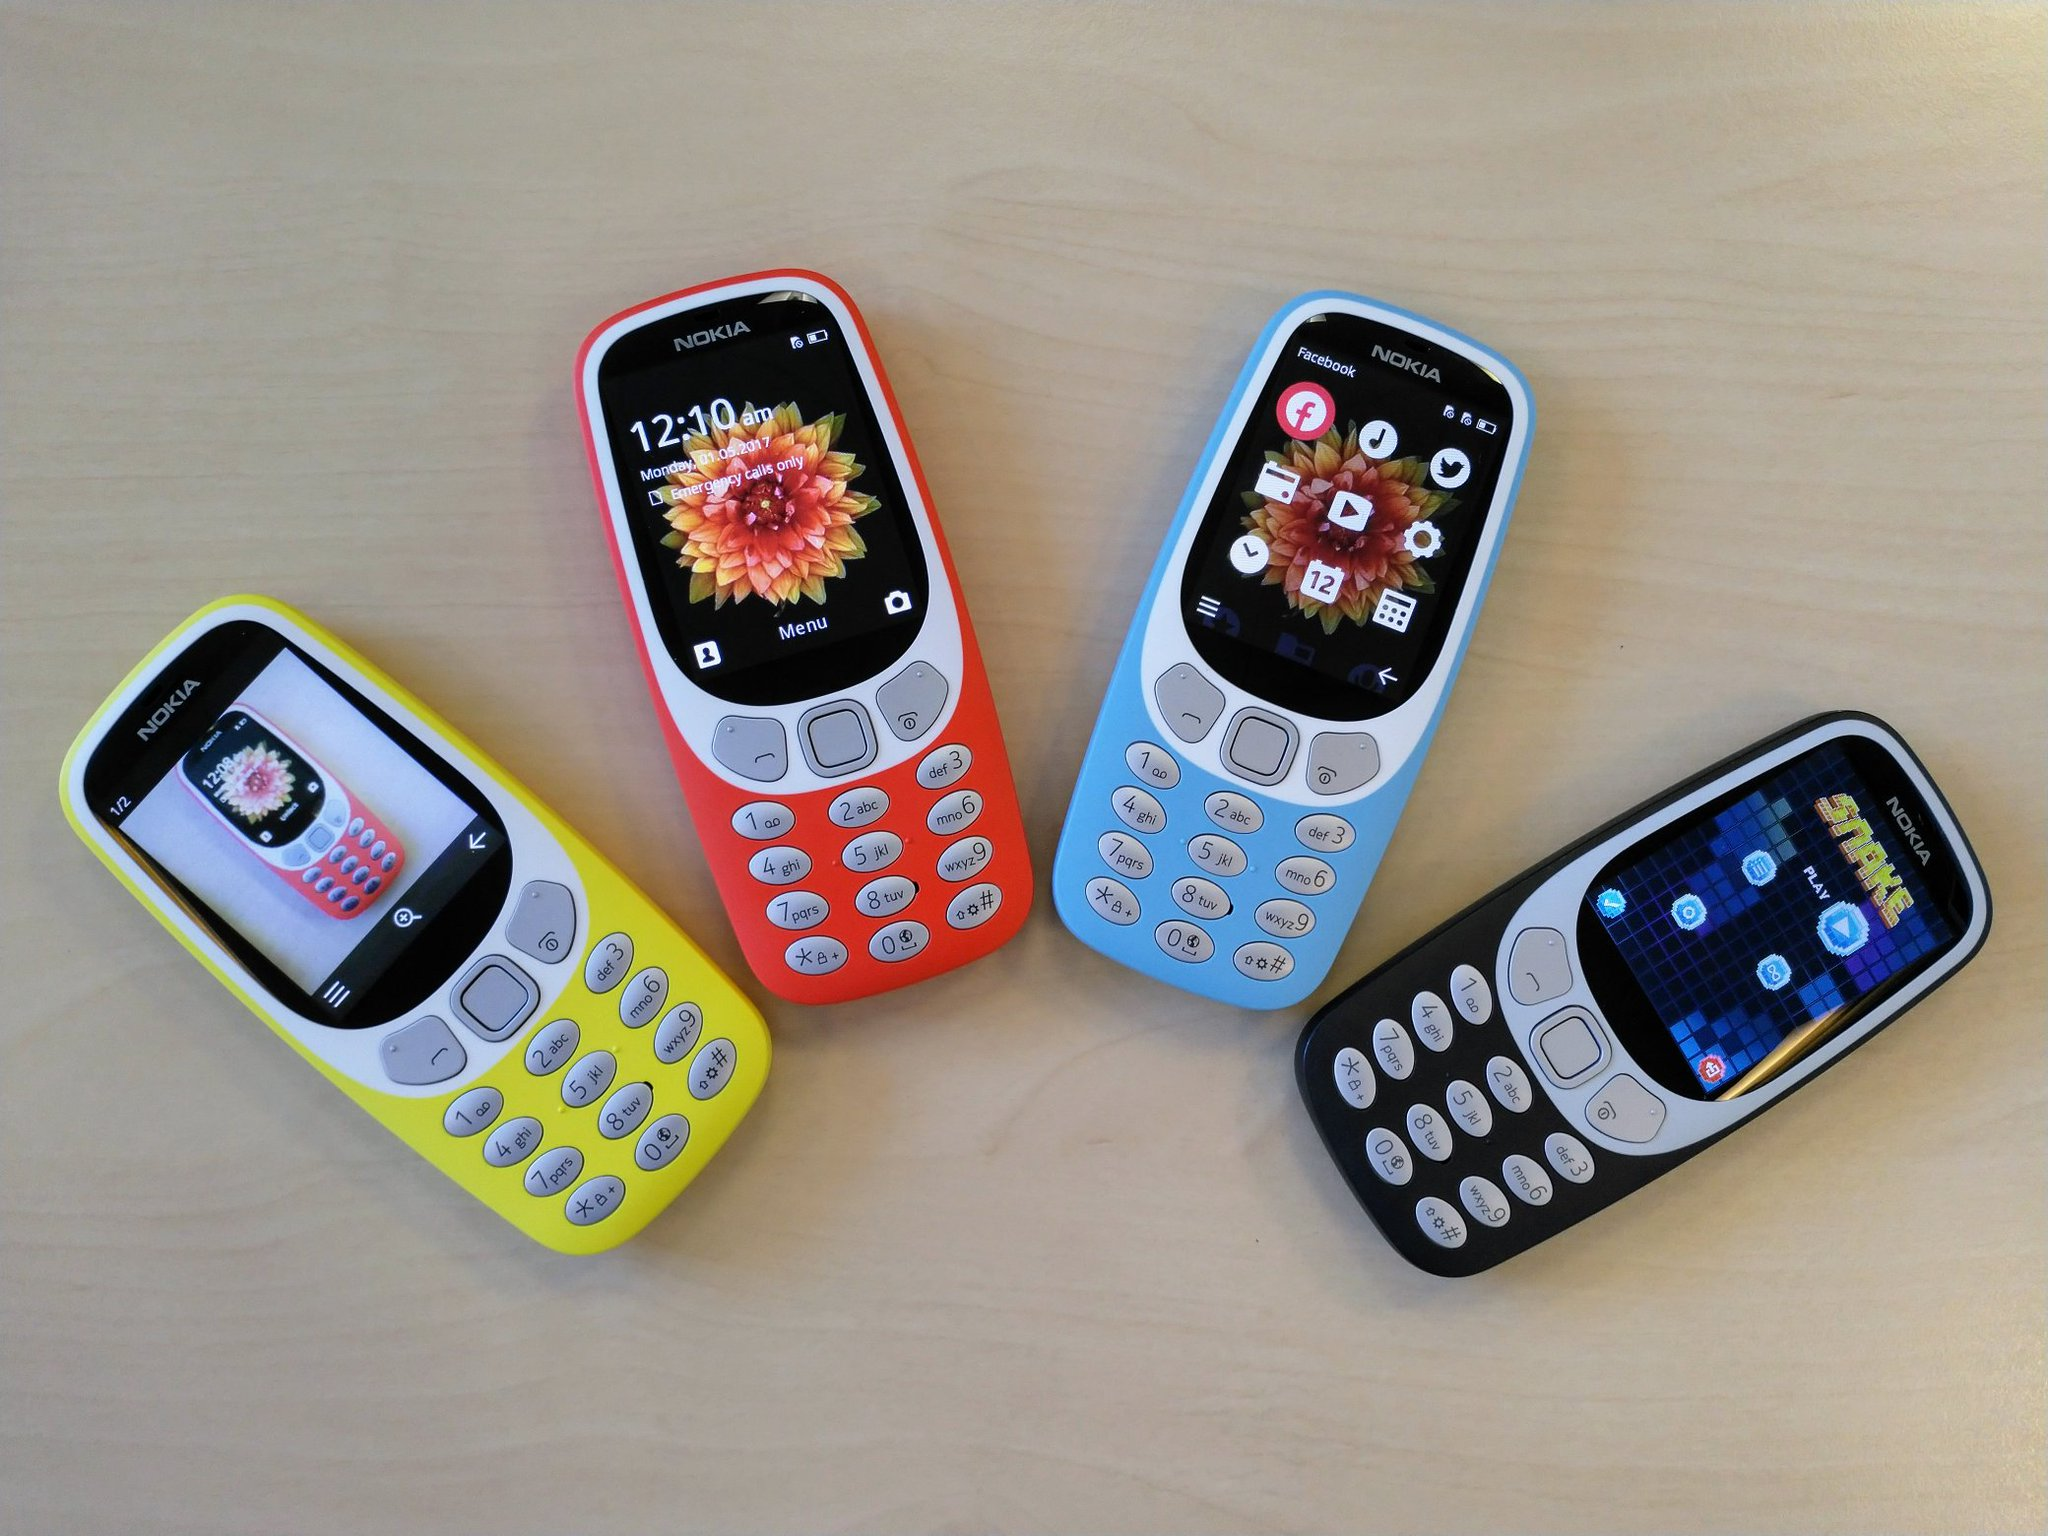 Nokia 3310 kommt auch als UMTS-Version